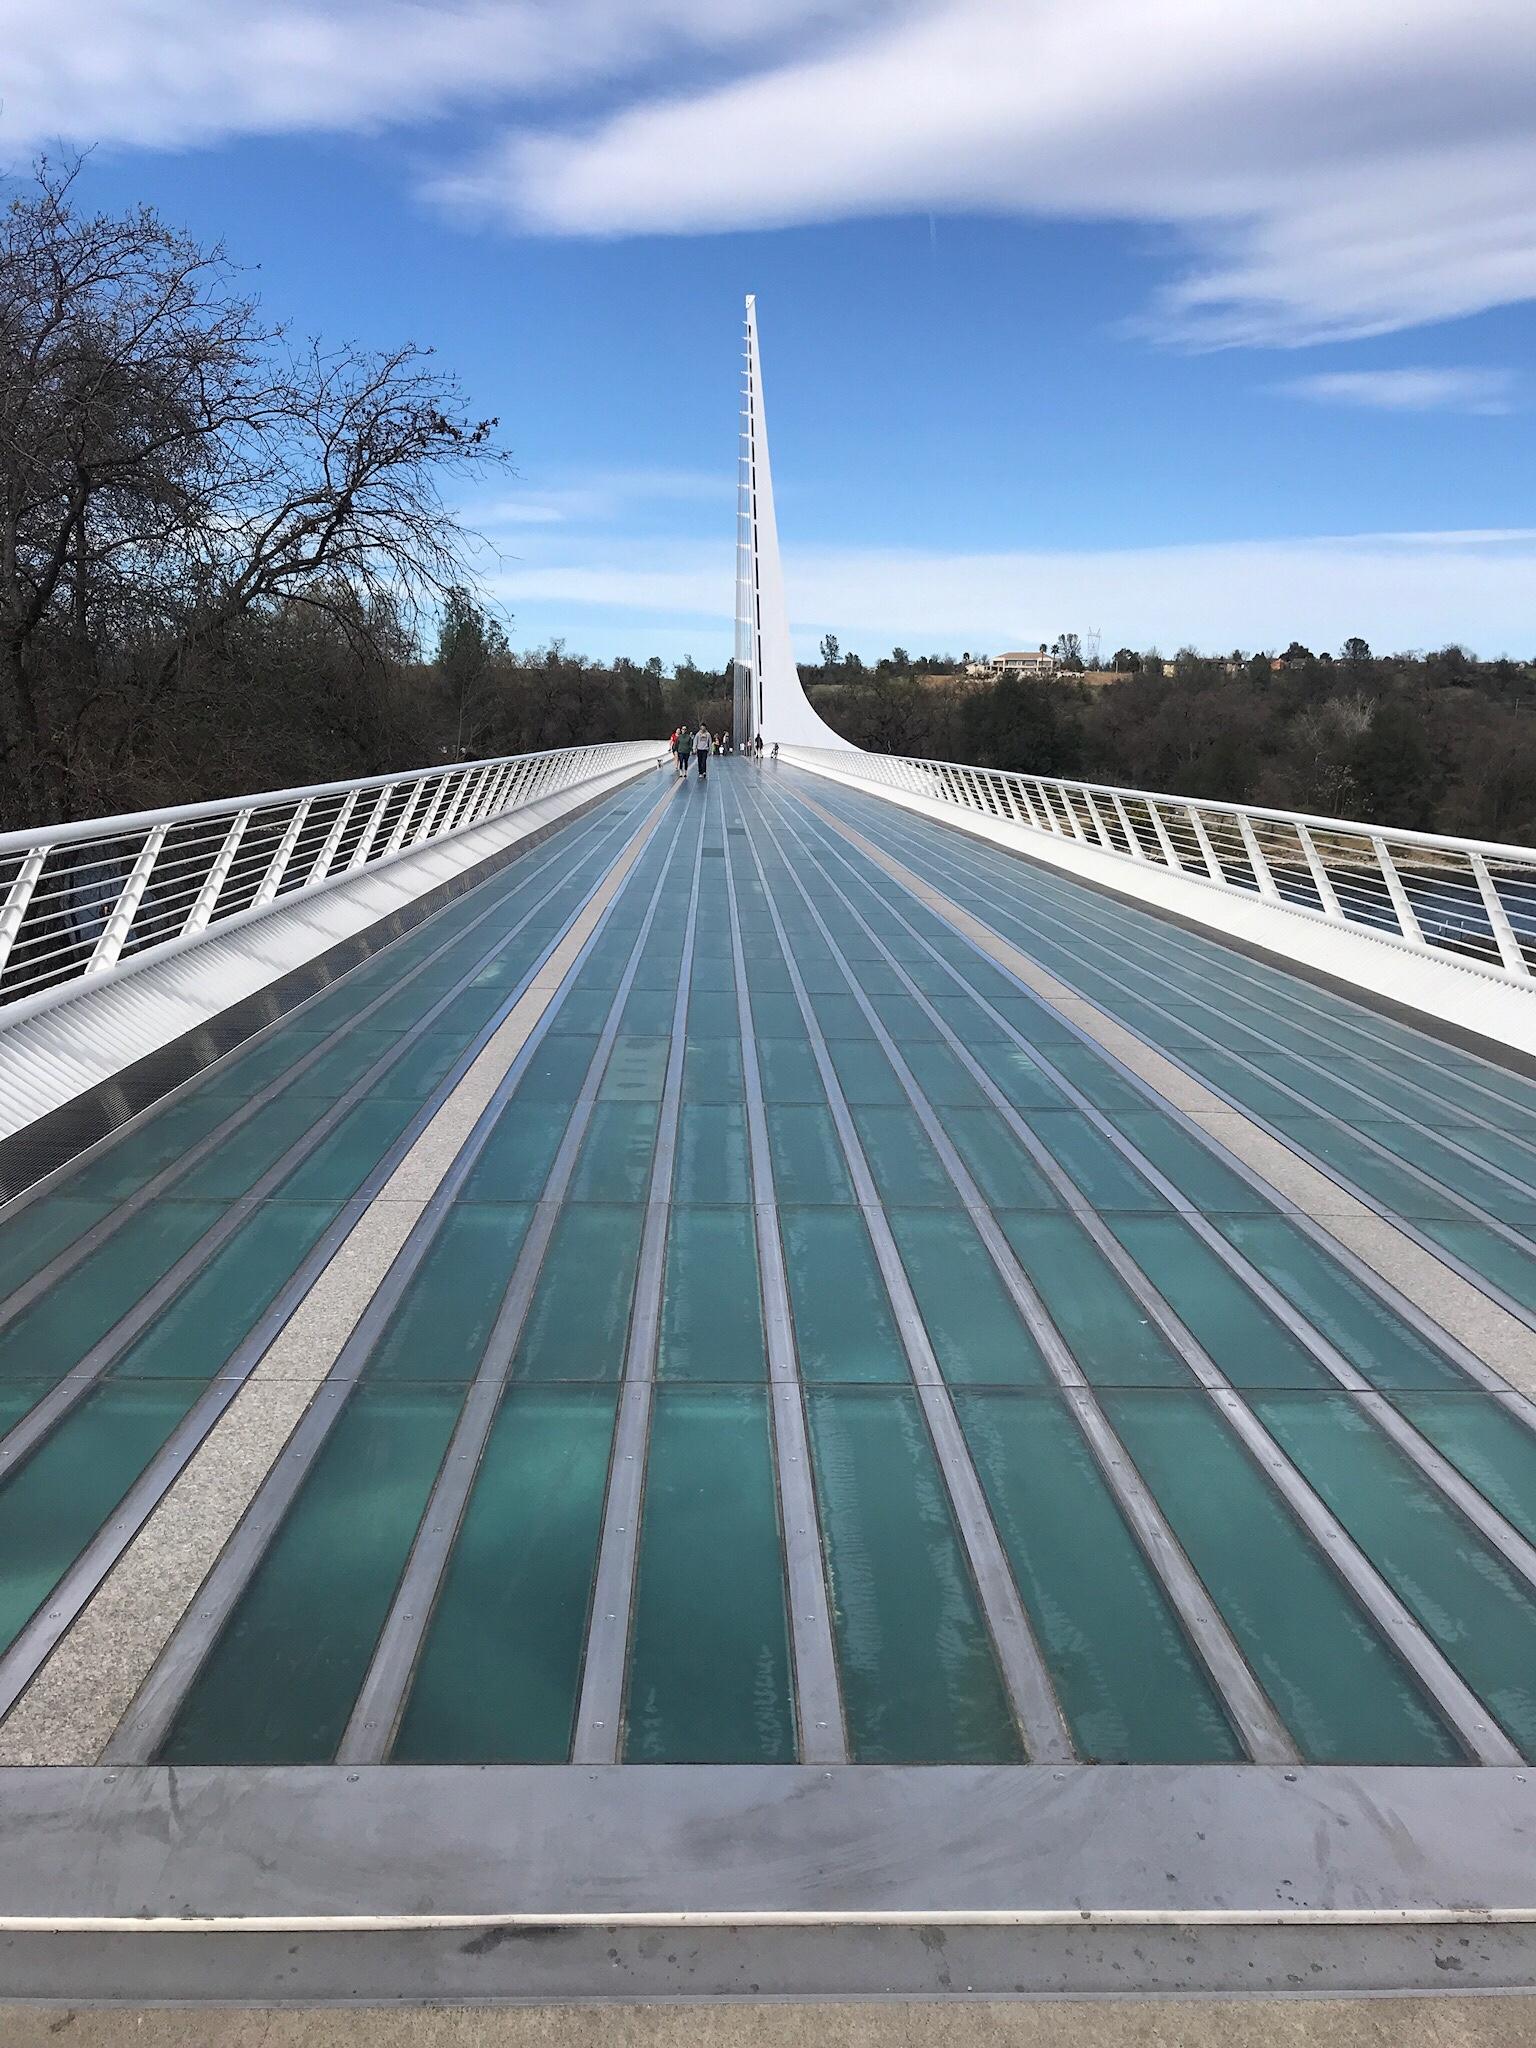 Deck of the Sundial Bridge.